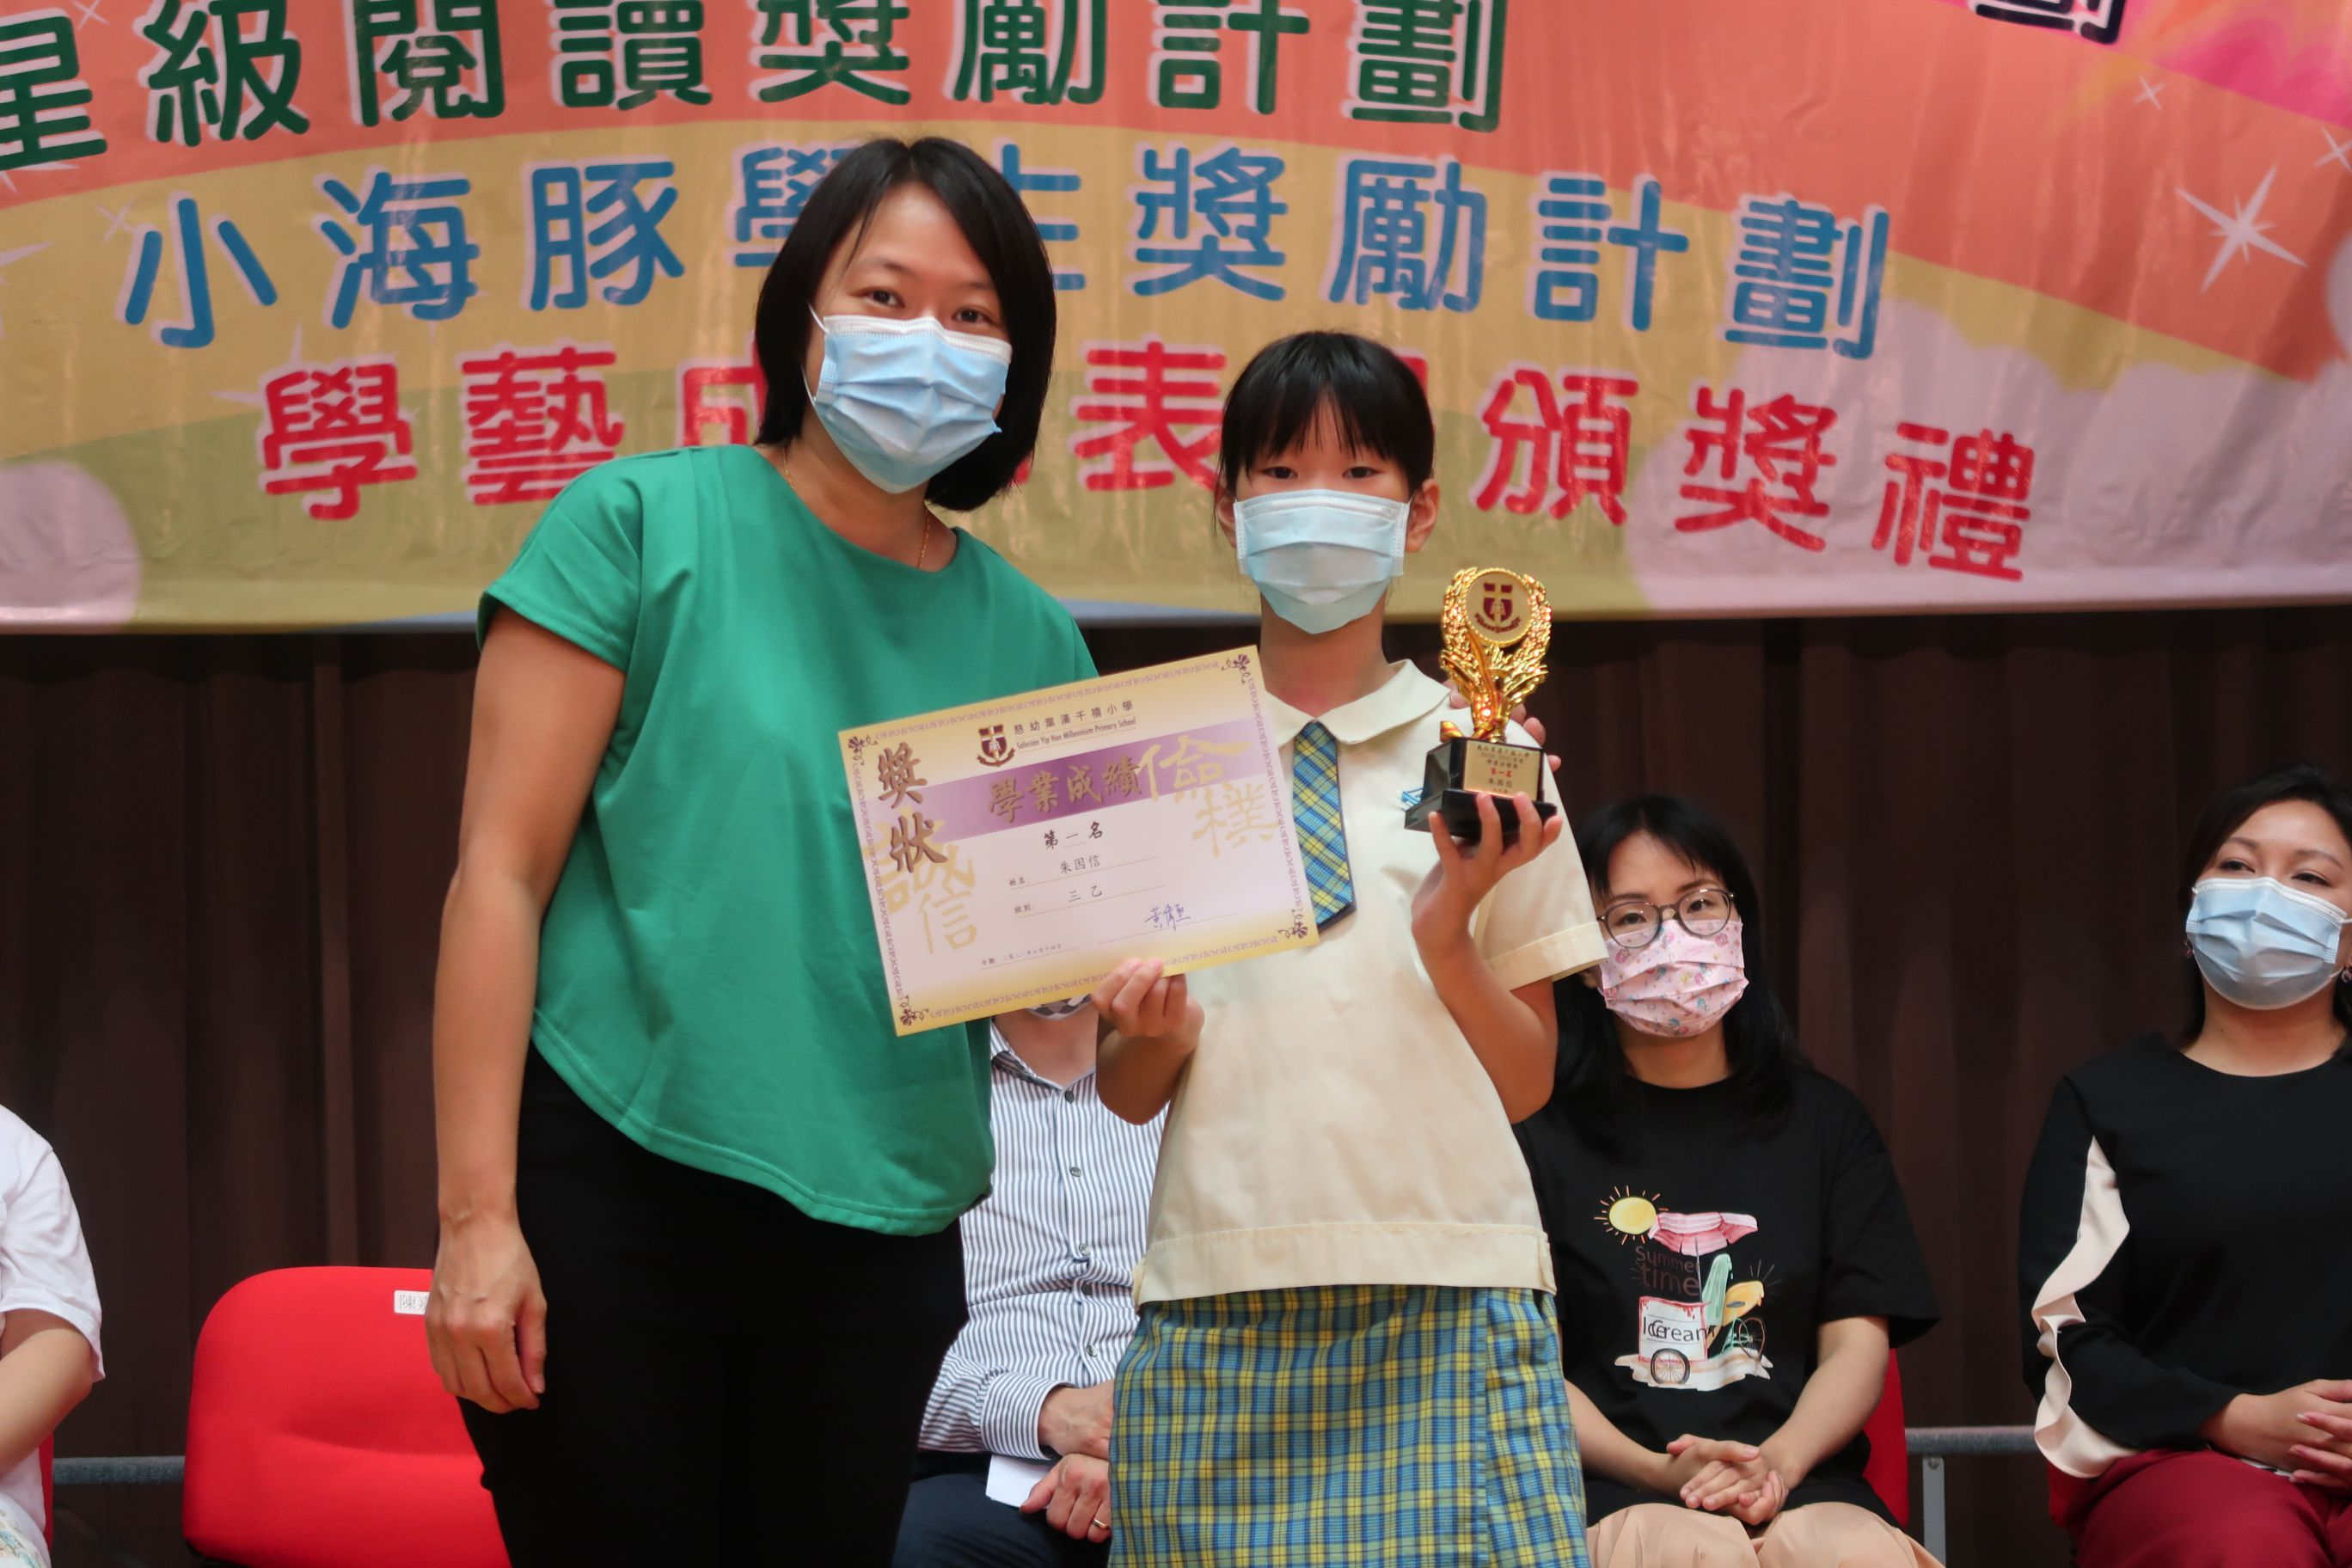 https://syh.edu.hk/sites/default/files/img_5434.jpg